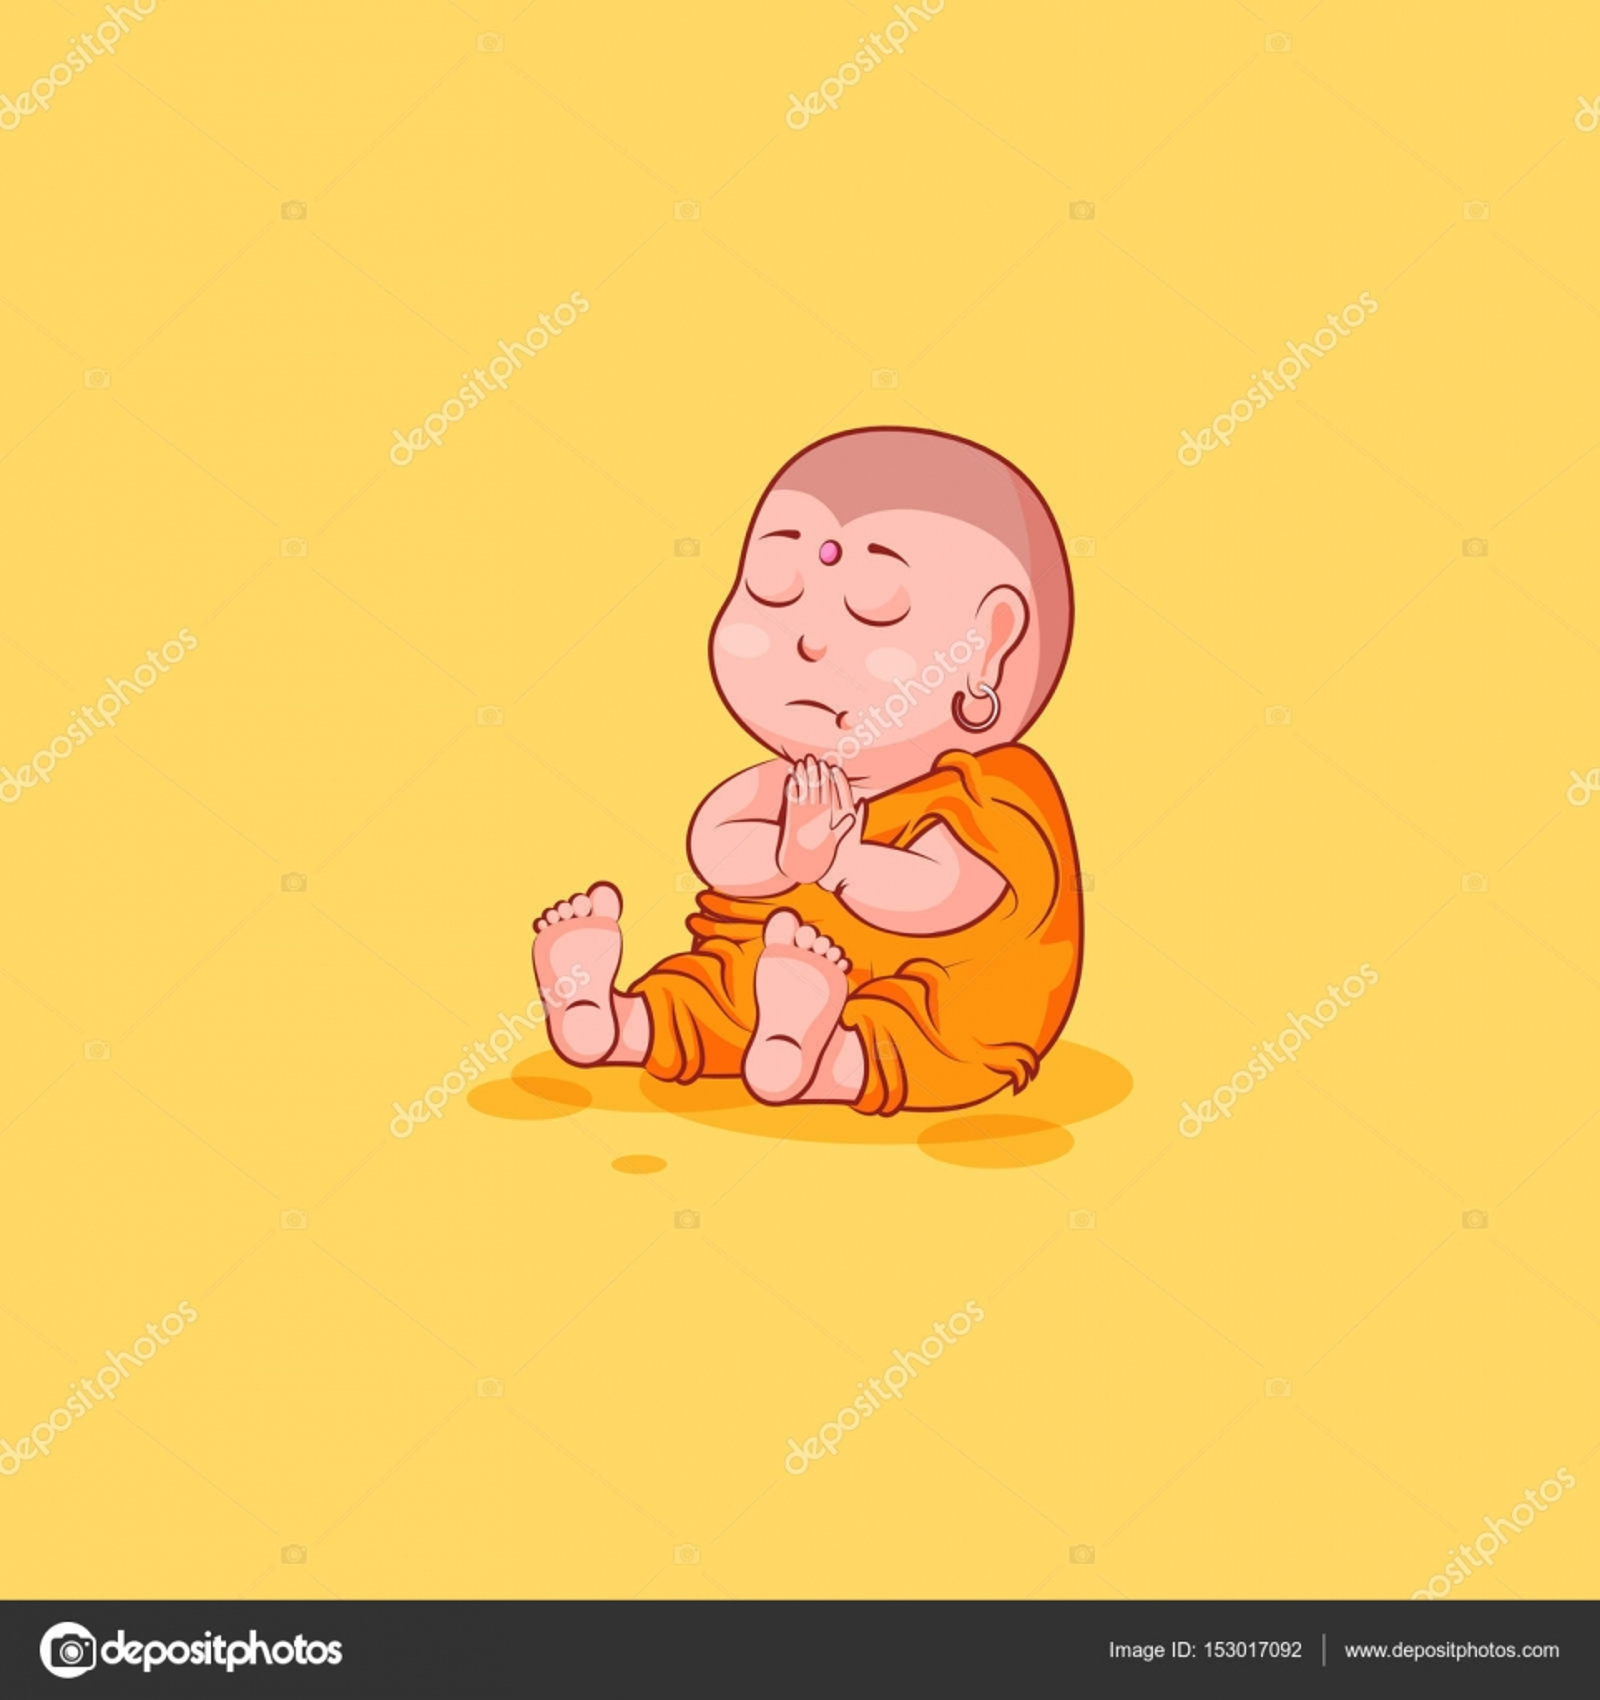 Sticker emoji emoticon emotion vector isolated illustration sticker emoji emoticon emotion vector isolated illustration happy character cartoon buddha sit meditate contemplation prayer sticker buddhist monk kashaya biocorpaavc Image collections